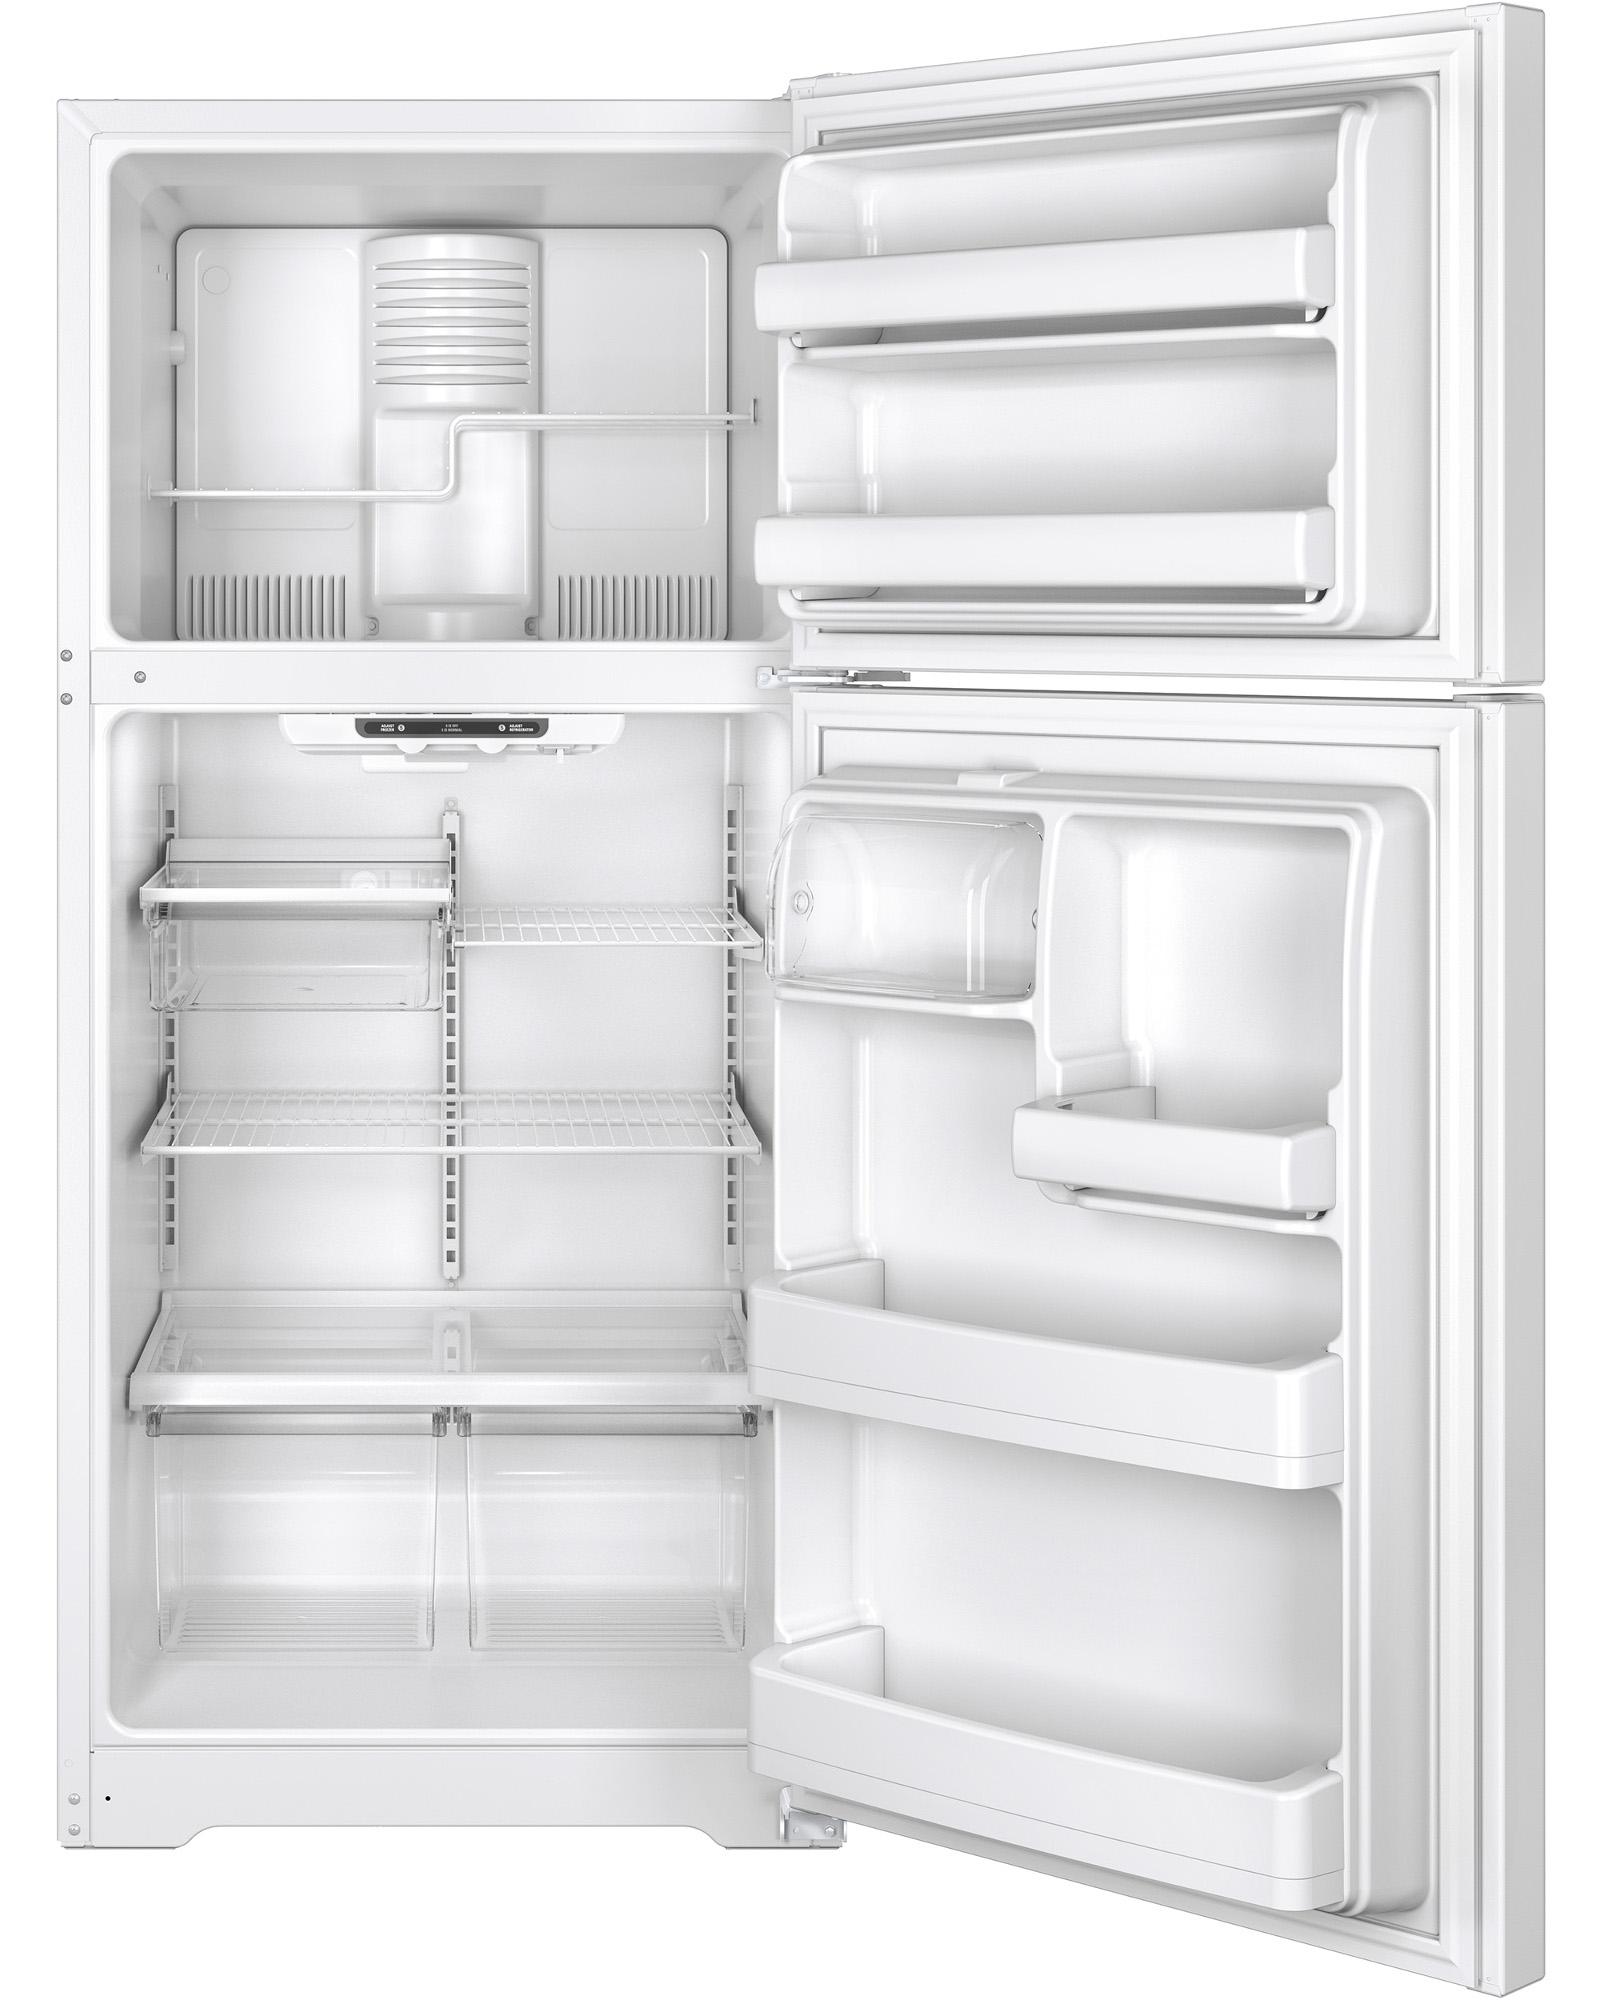 GE Appliances GTE18ETHWW 18.2 cu. ft. Top-Freezer Refrigerator - White